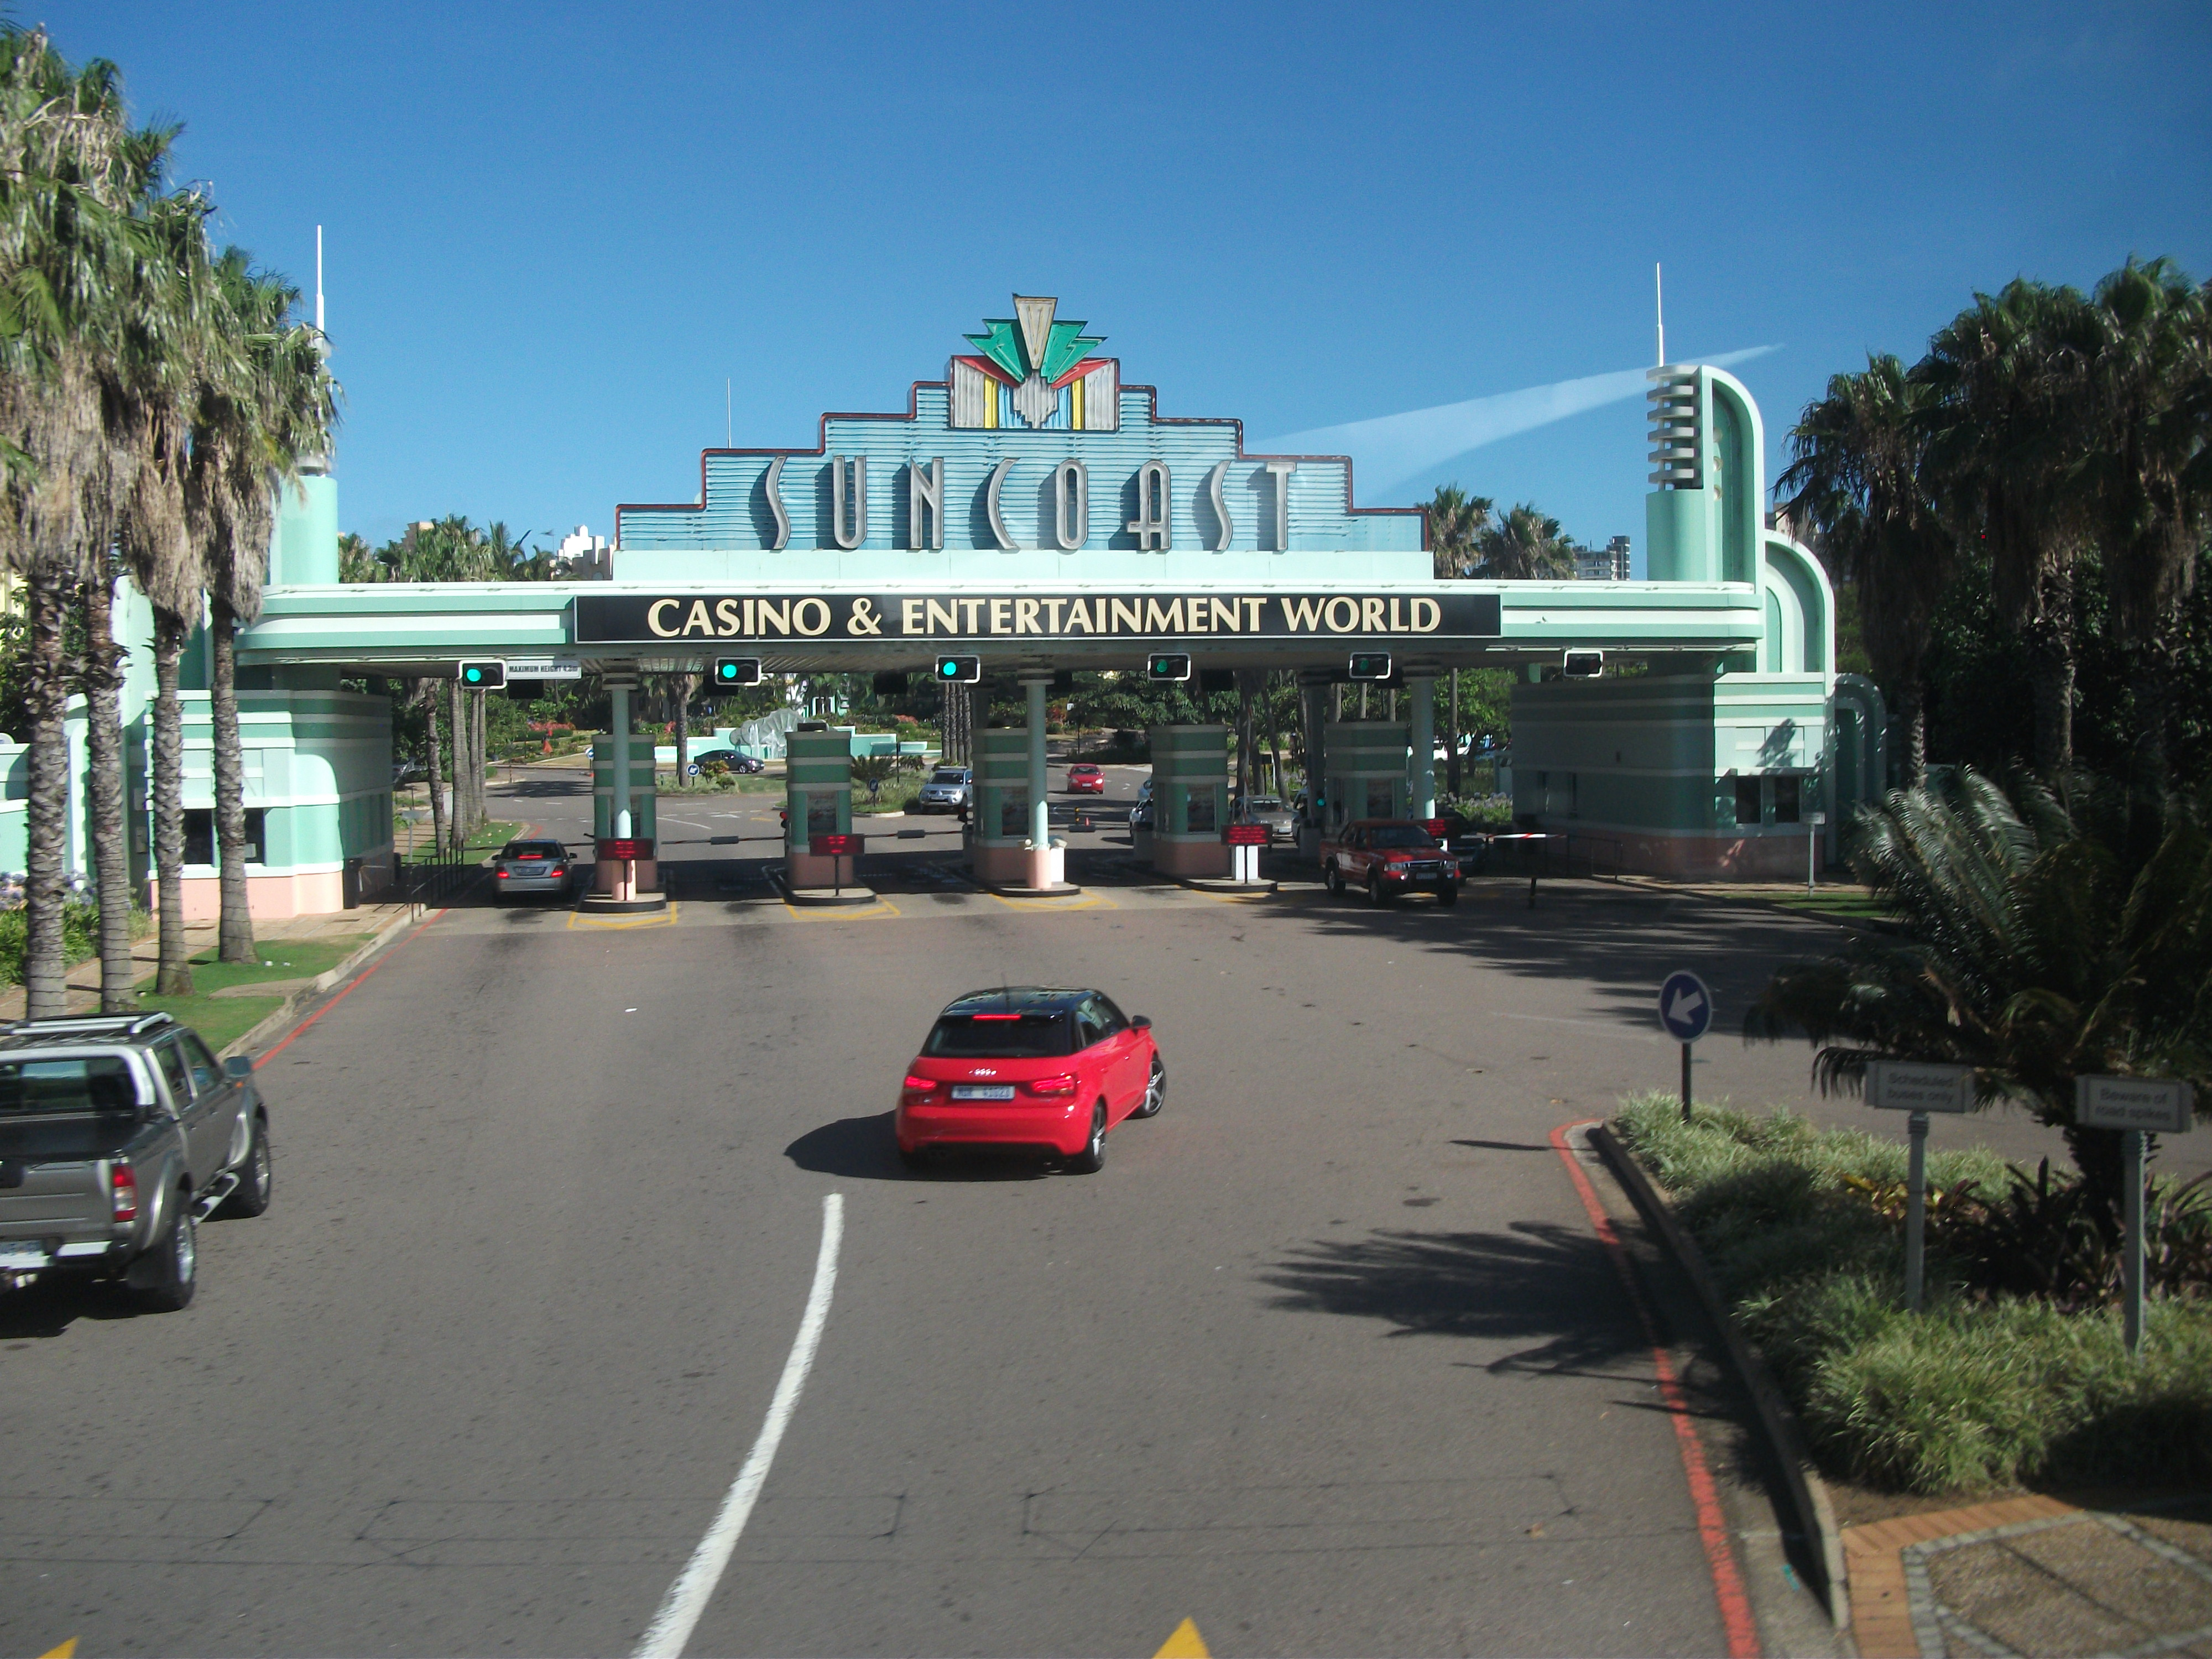 Suncoast casino accommodation pala casino in escondido ca